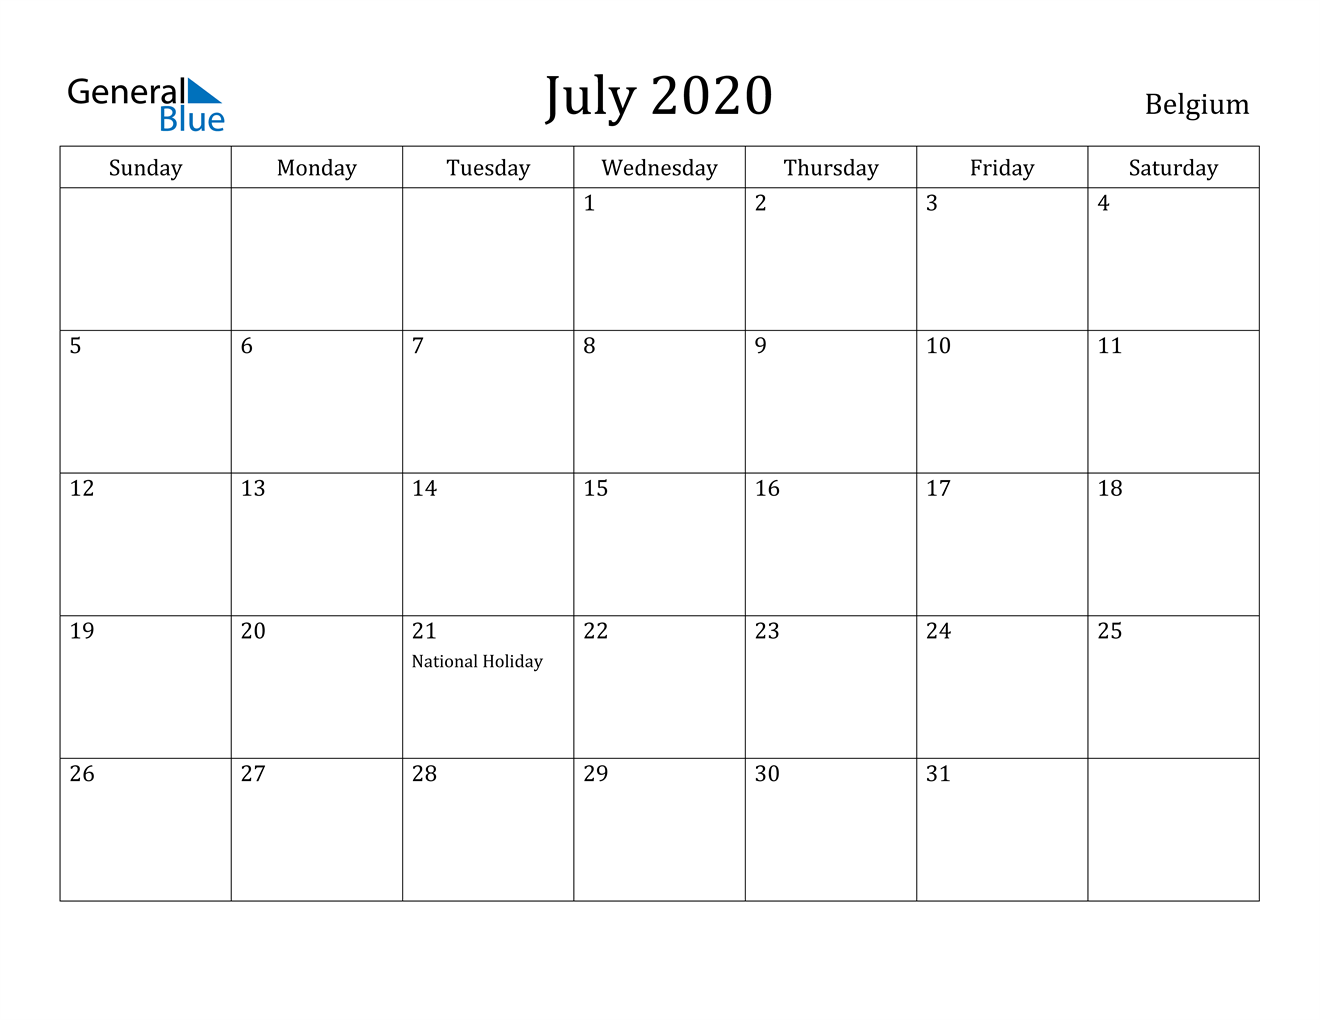 July 2020 Calendar Holidays UK